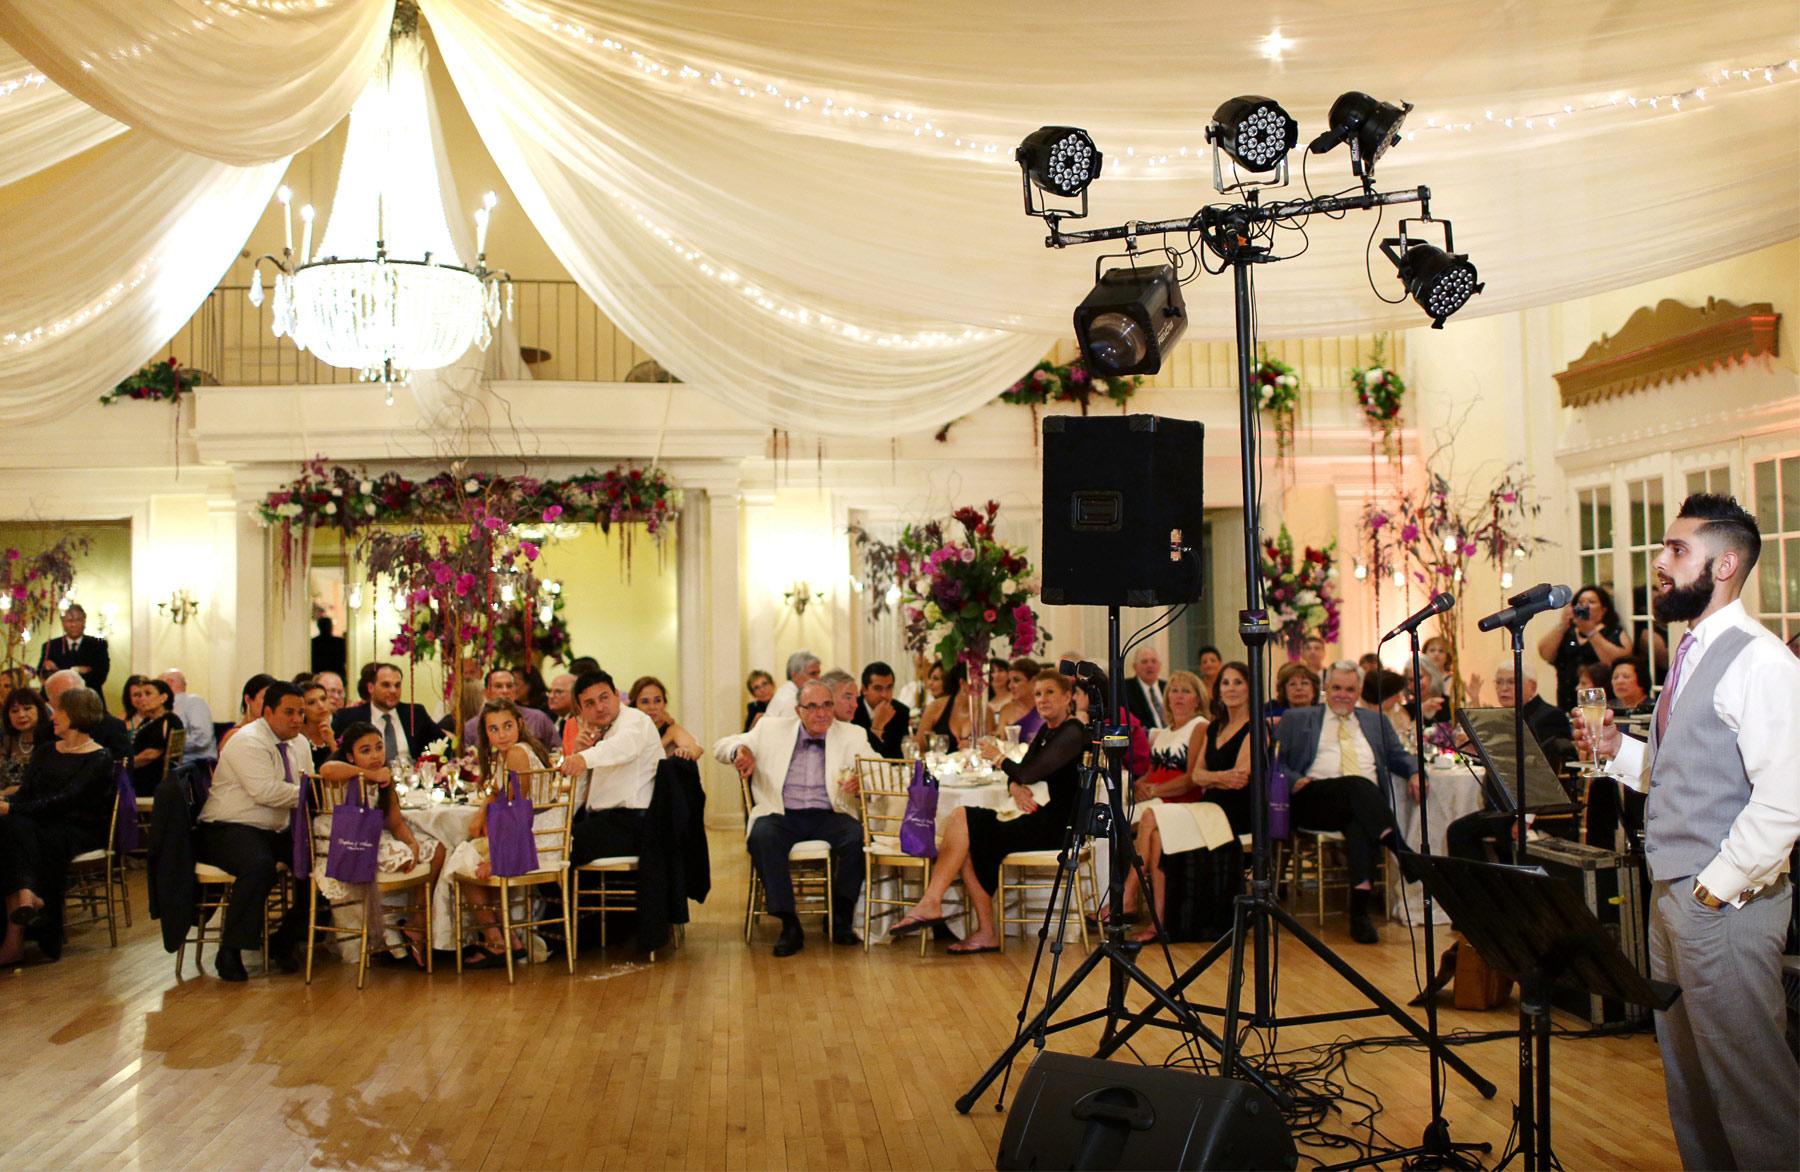 13-Minneapolis-Minnesota-Wedding-Photography-by-Vick-Photography-Lafayette-Country-Club-Reception-Daphne-&-Austin.jpg